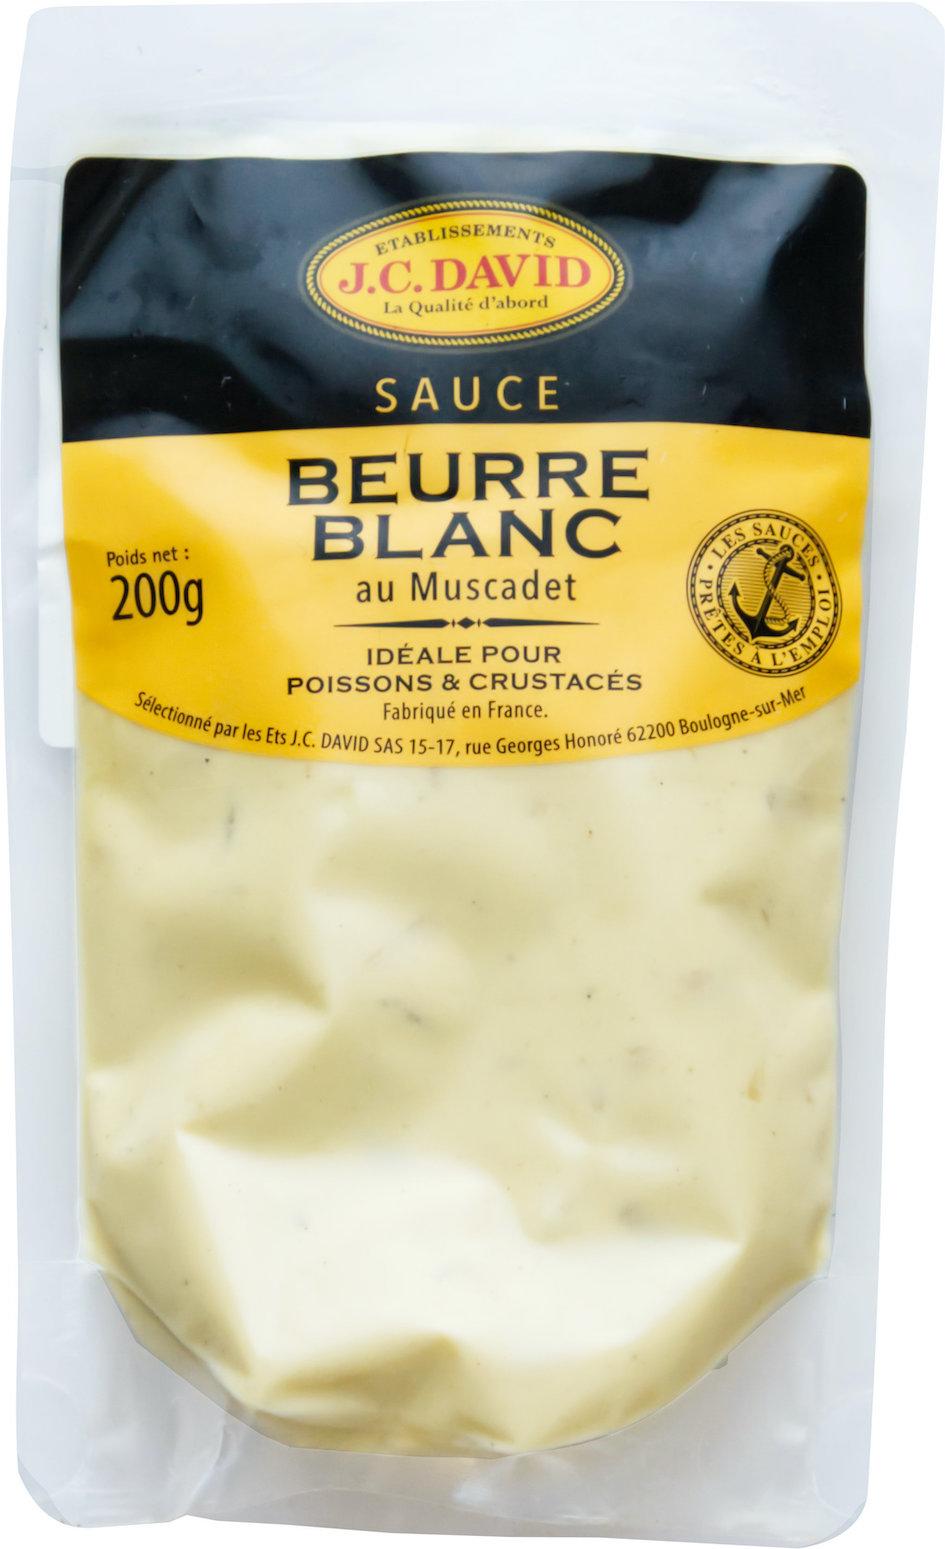 SAUCE BEURRE BLANC - 200 g